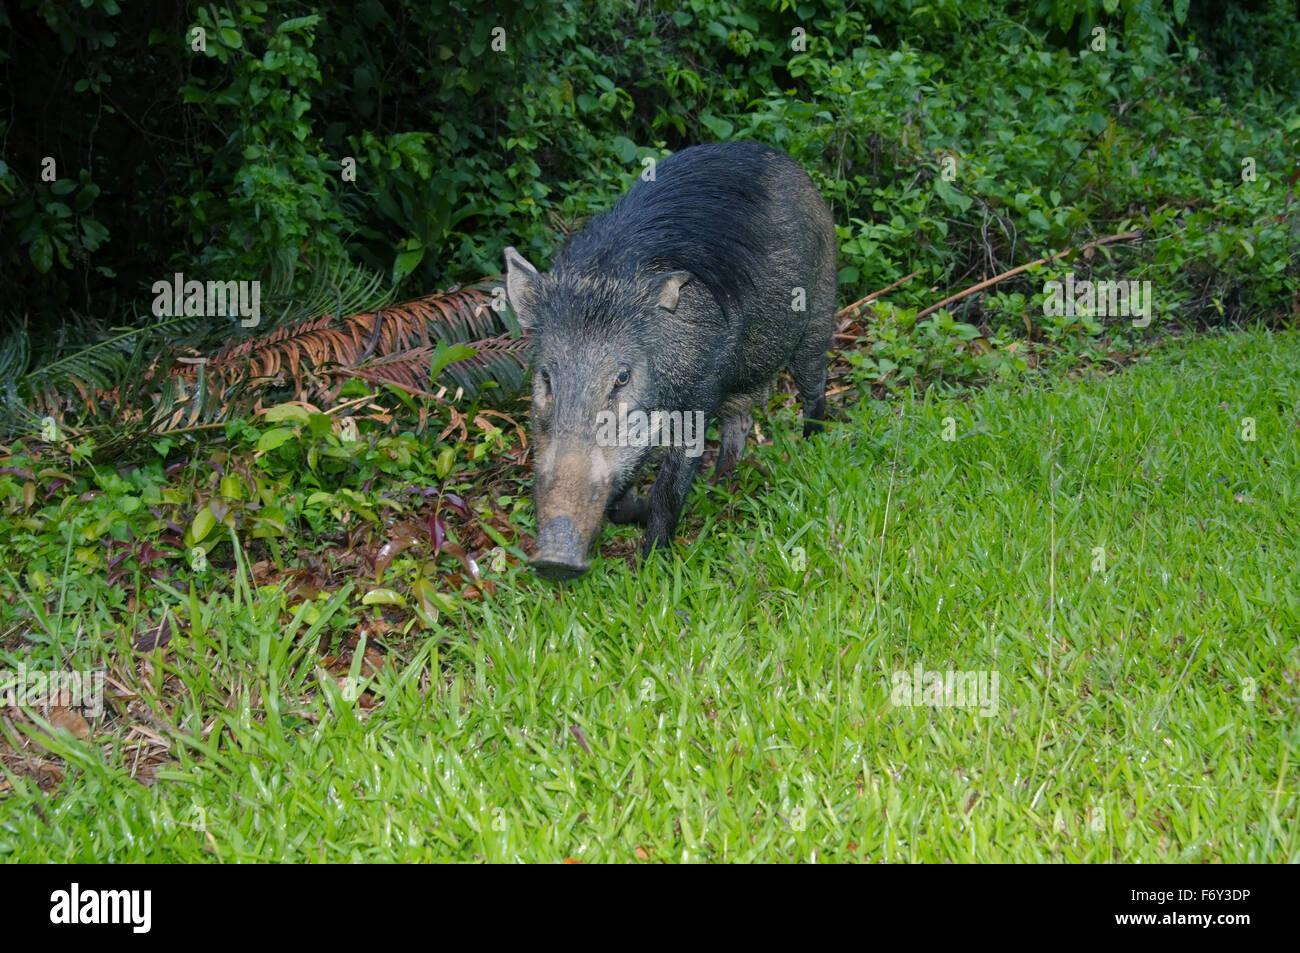 Wild boar, wild swine or Eurasian wild pig (Sus scrofa), Malaysia - Stock Image